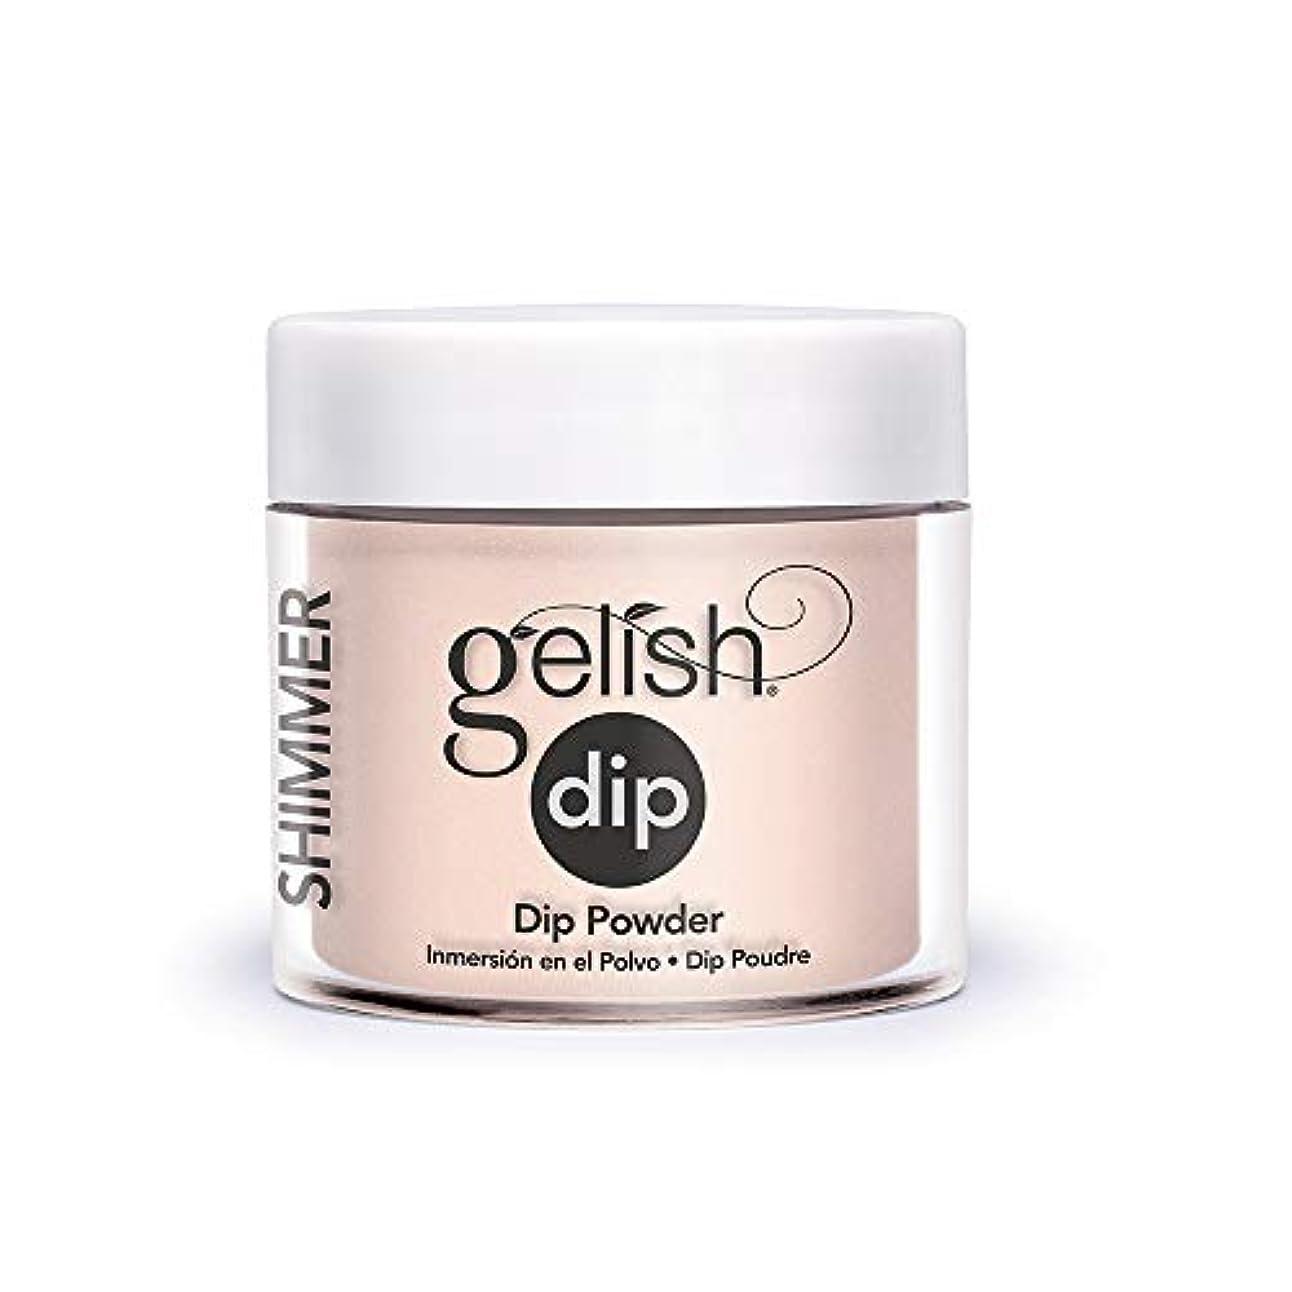 環境保護主義者化学者選ぶHarmony Gelish - Acrylic Dip Powder - Heaven Sent - 23g / 0.8oz